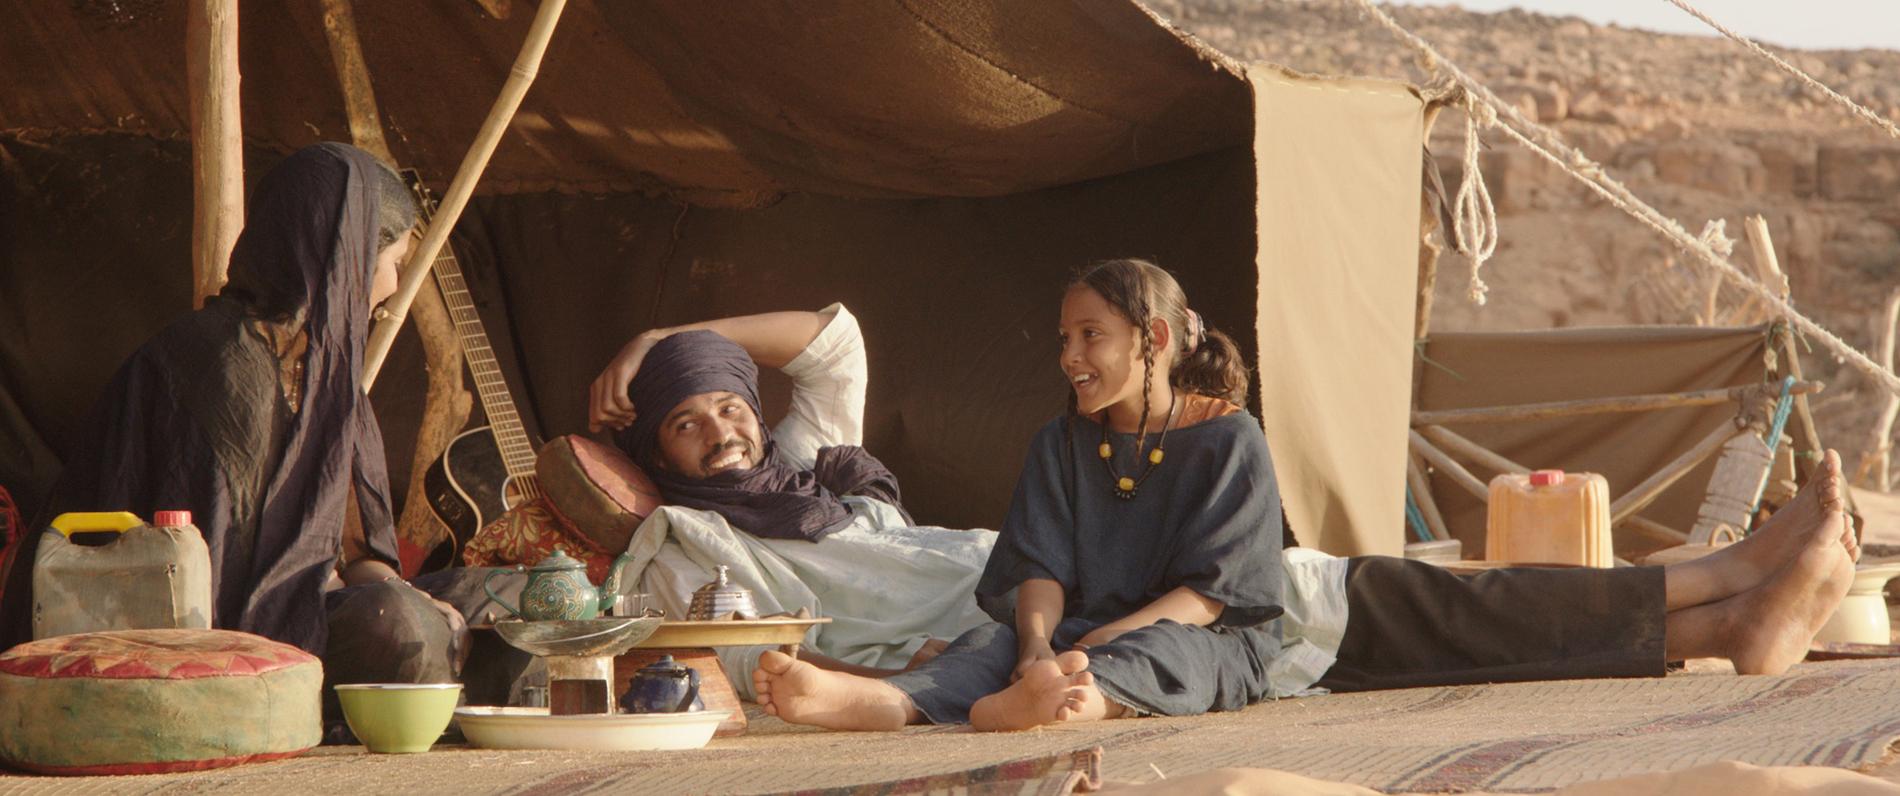 TIMBUKTU de Abderrahmane Sissako film still 4_d00bd5fc-ca9d-e411-b62a-d4ae527c3b65